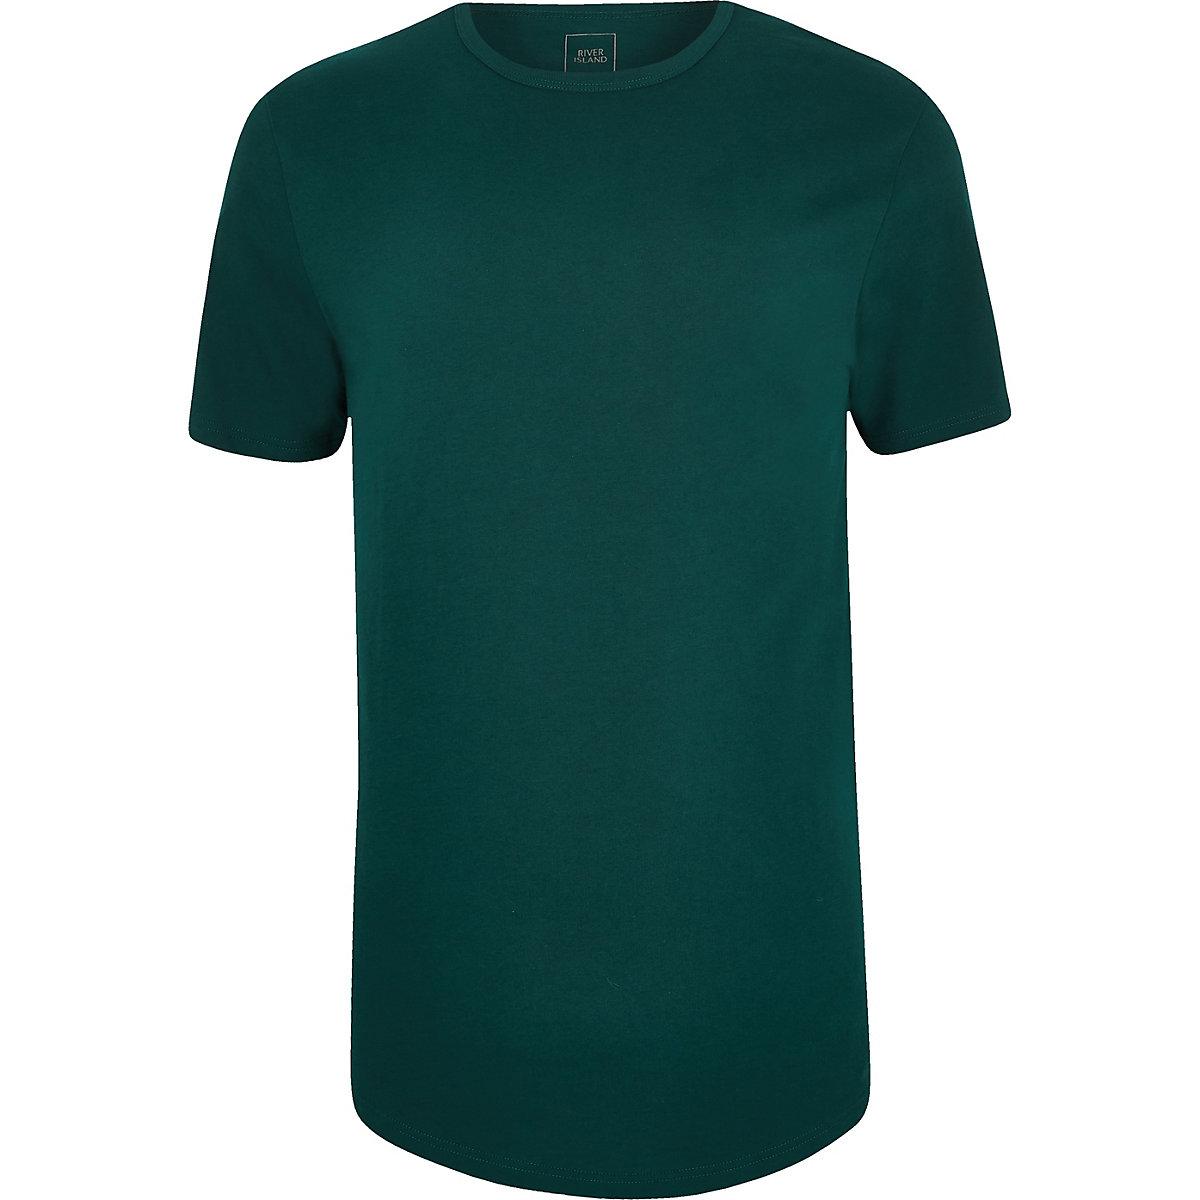 Teal longline curved hem T-shirt